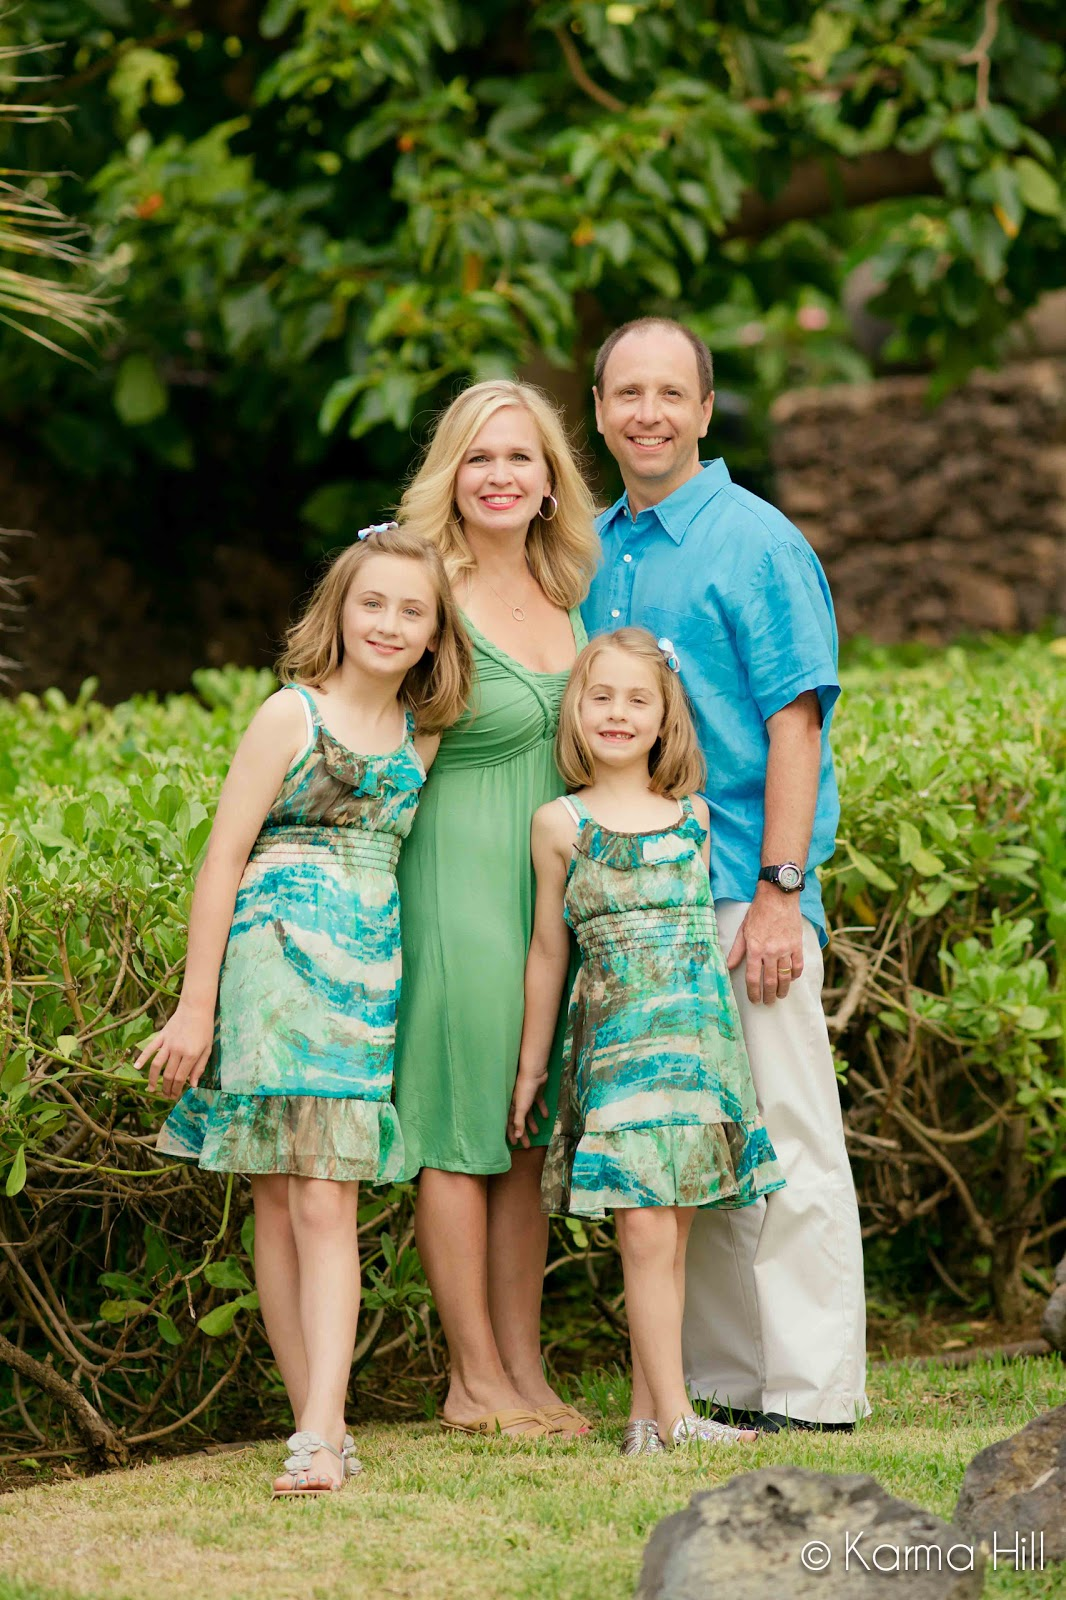 Maui Photographers by Maui Vacation Portraits: WHAT TO WEAR?